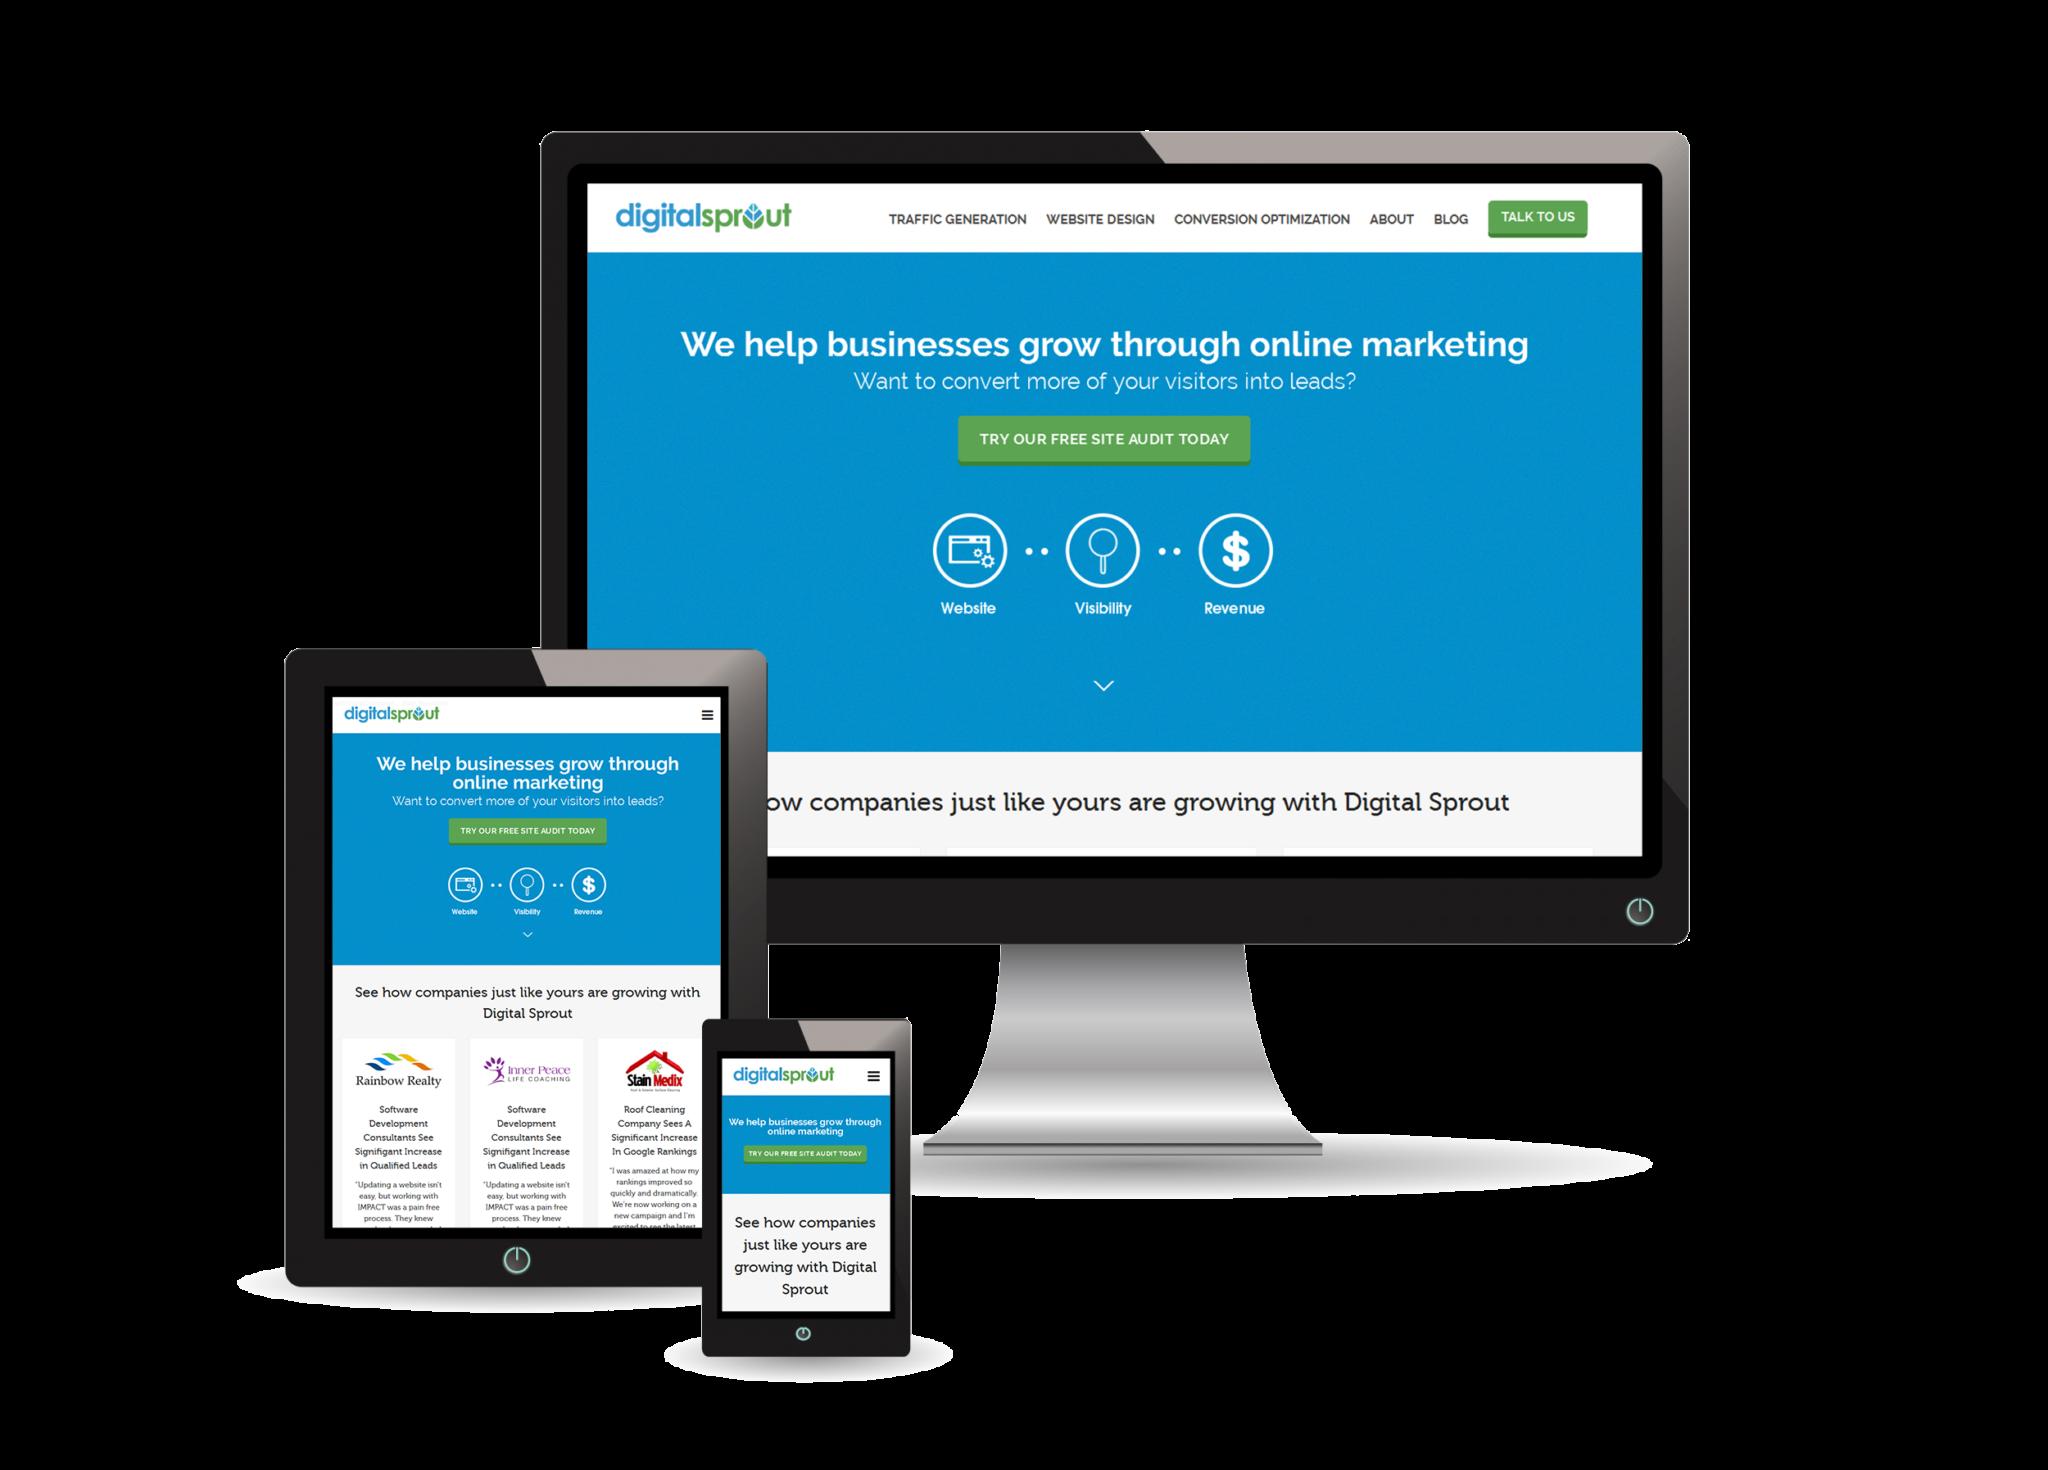 Responsive Web Design - Digital Sprout